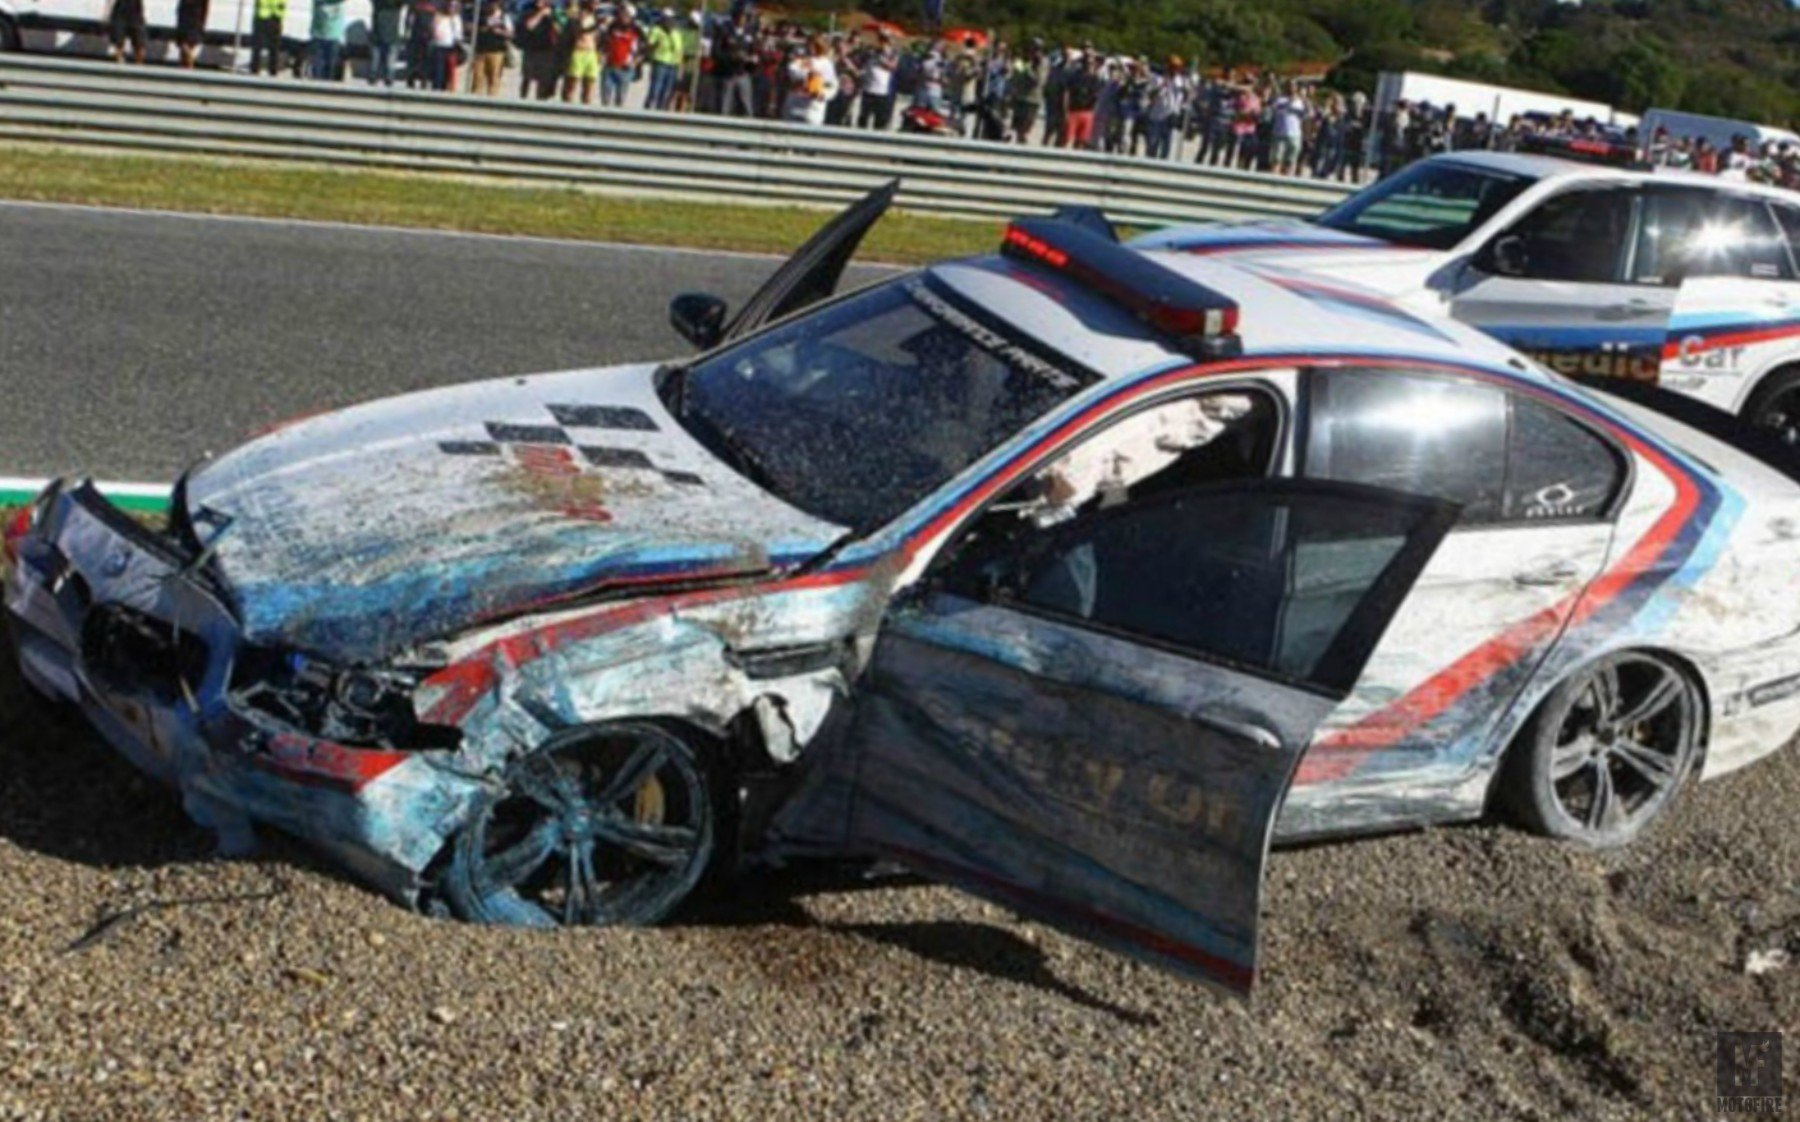 MotoGP BMW M5 Pace Car Crashes at Jerez - BimmerFile